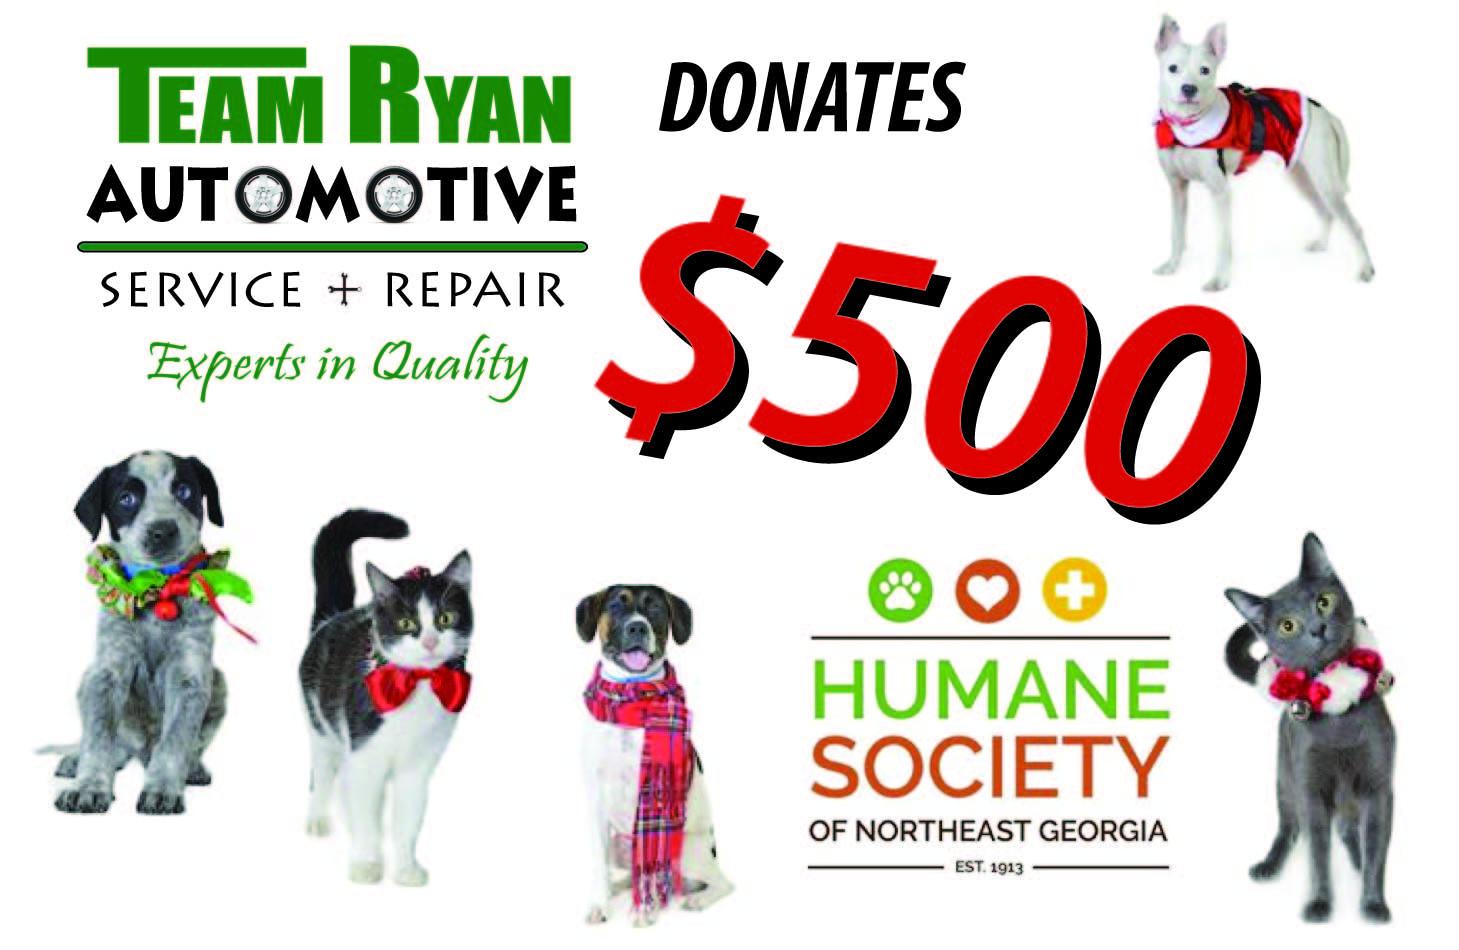 team ryan automotive donates to humane society-01-01.jpg